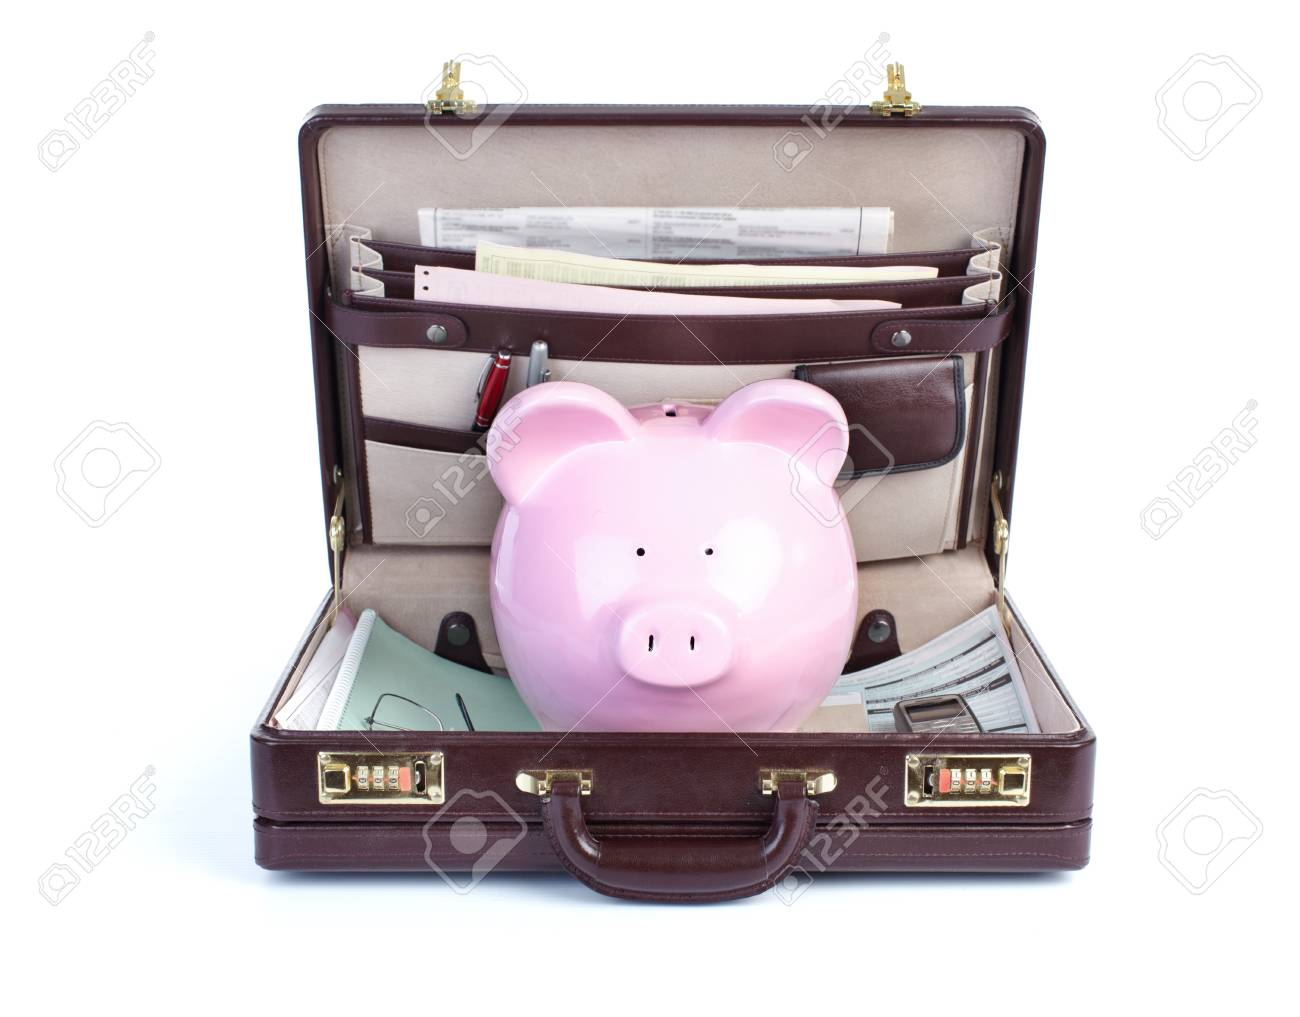 Pig and portofolio on a white background - 8466365